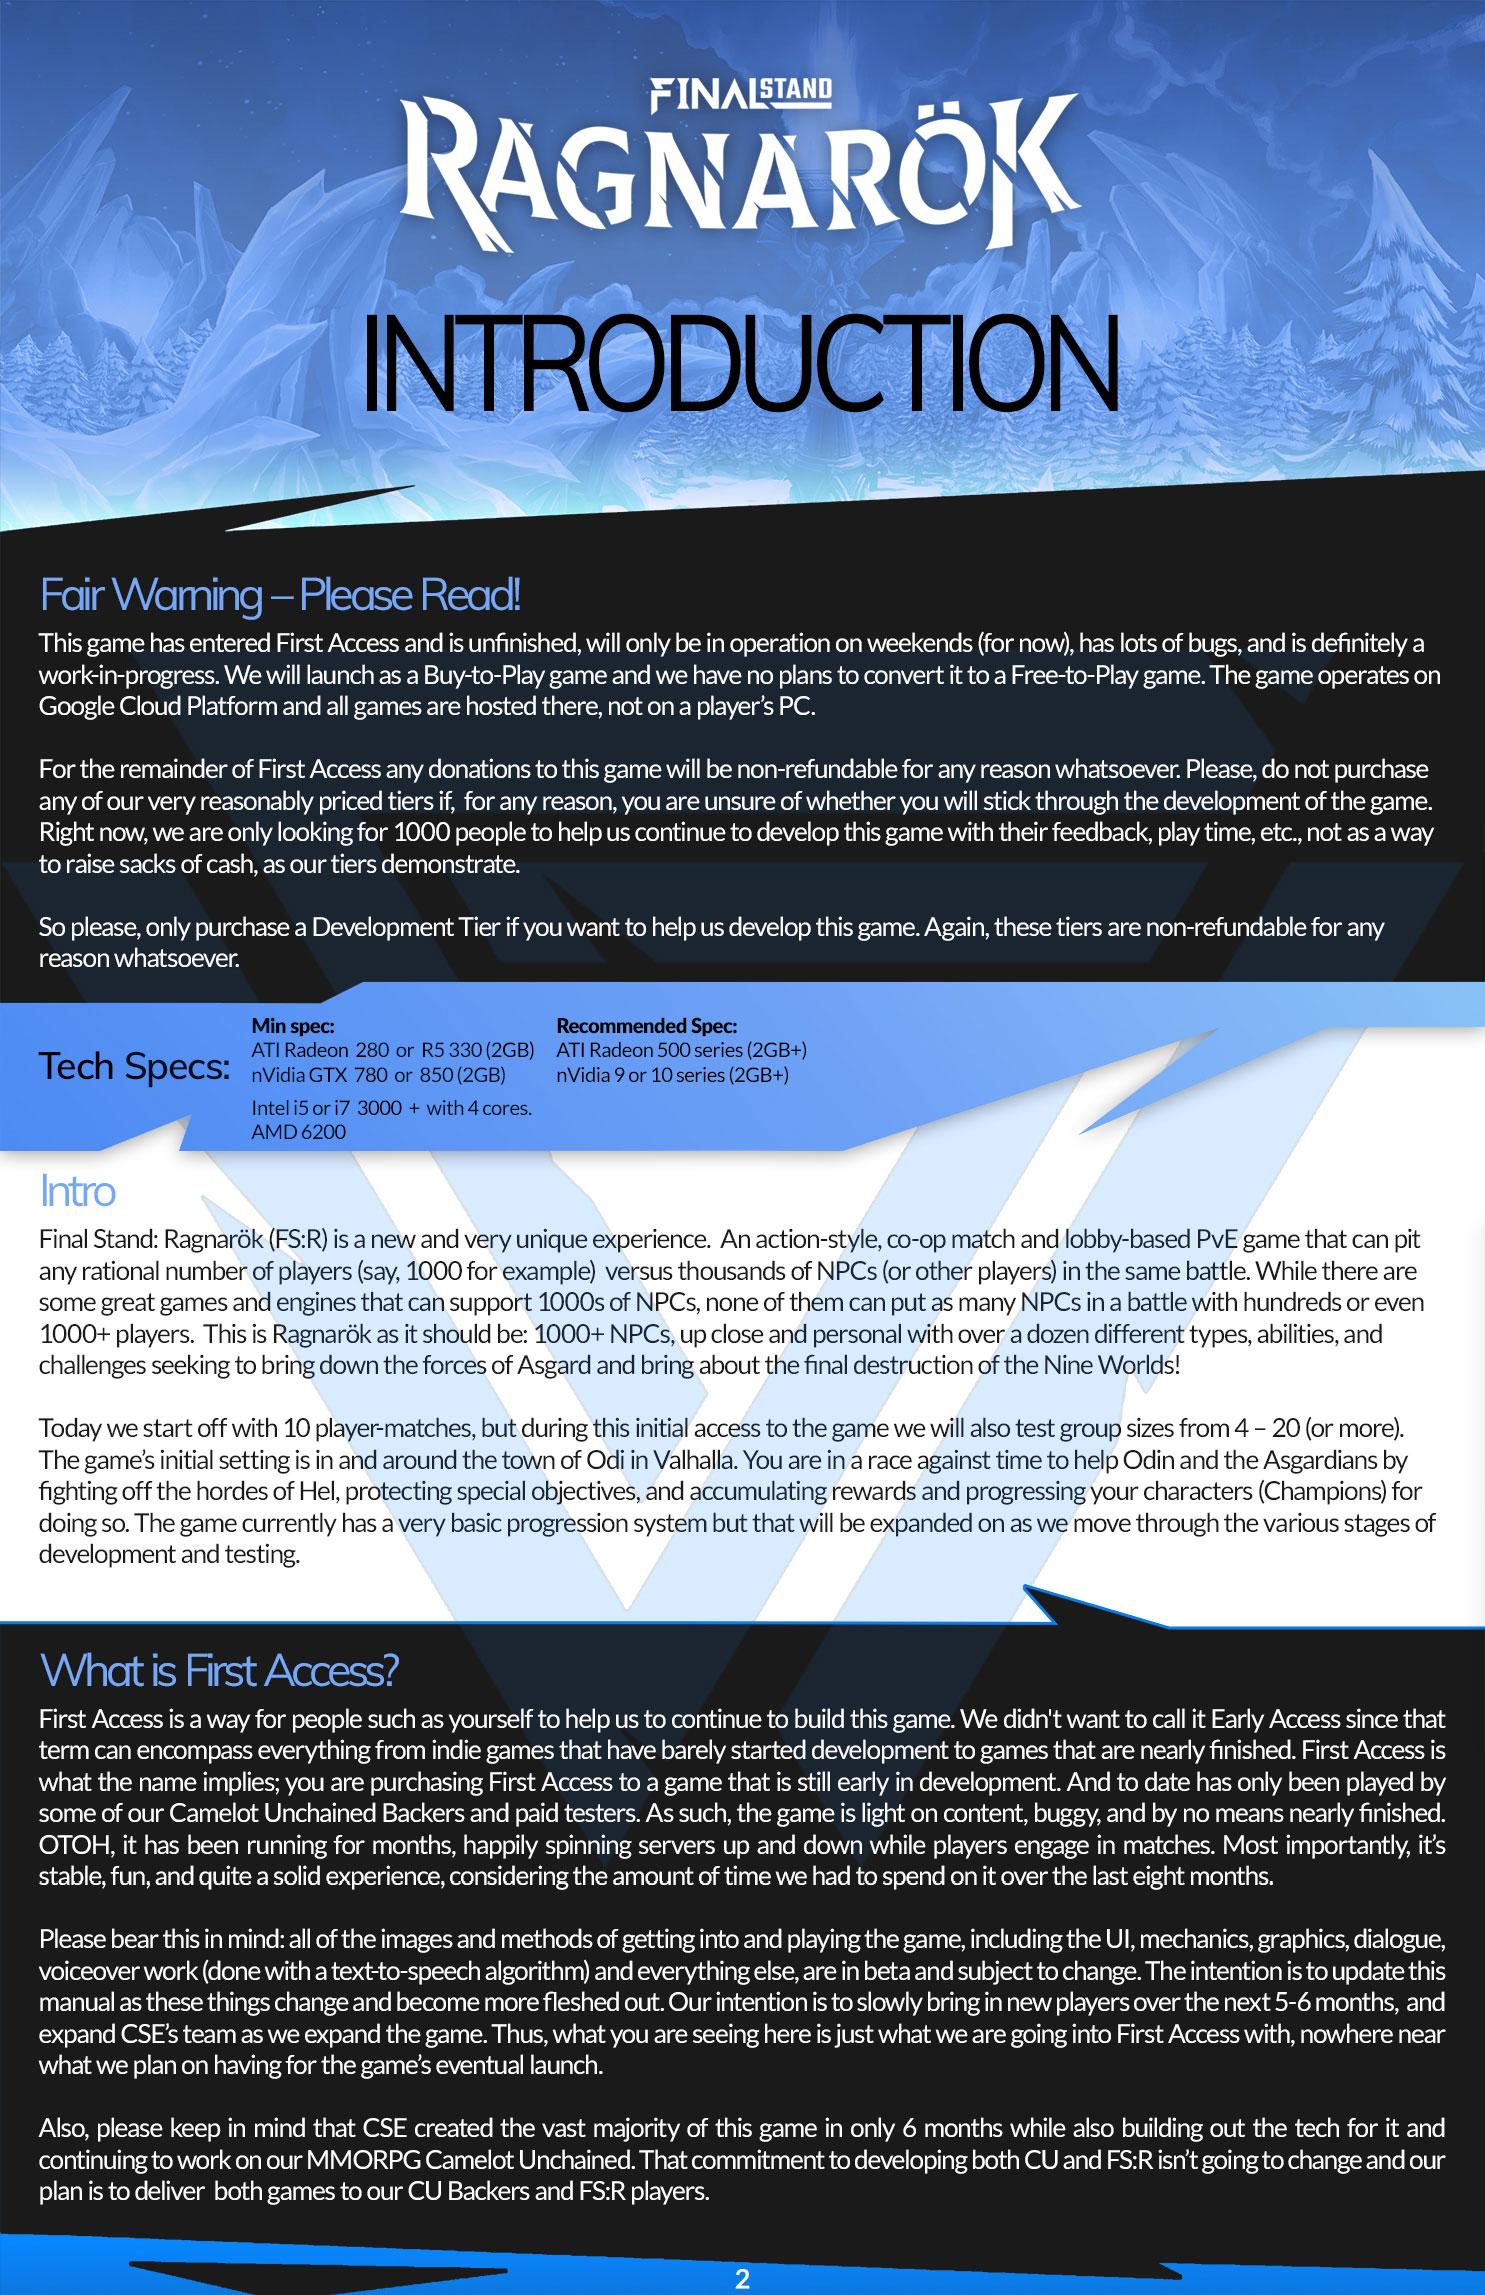 FSR-Guide_11x17_master_17-Final-for-FA-3